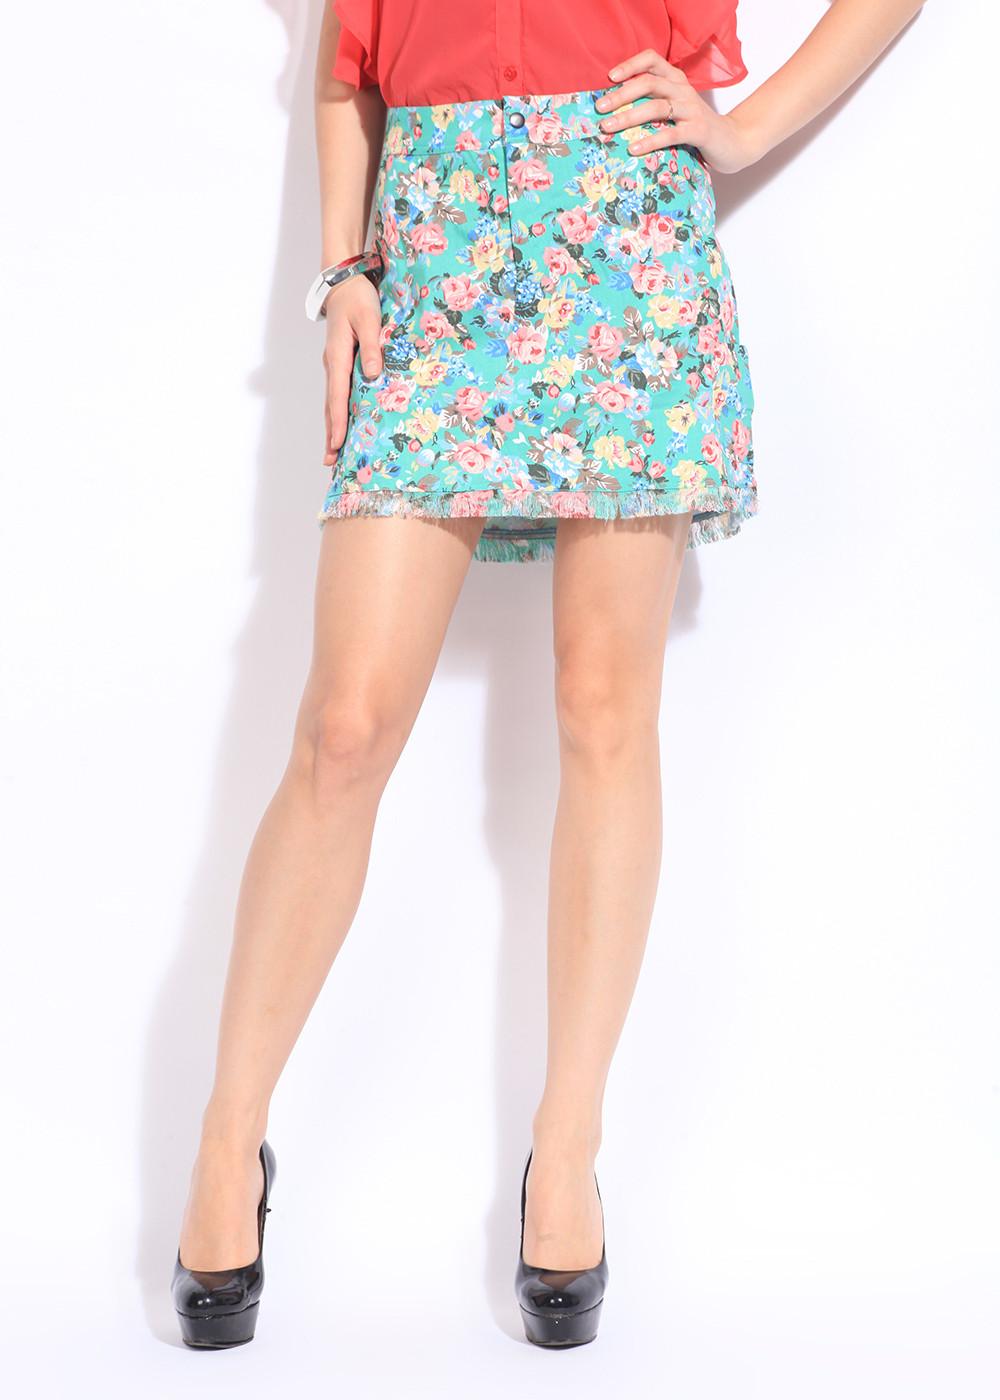 Remanika Floral Print Womens Green, Pink Skirt